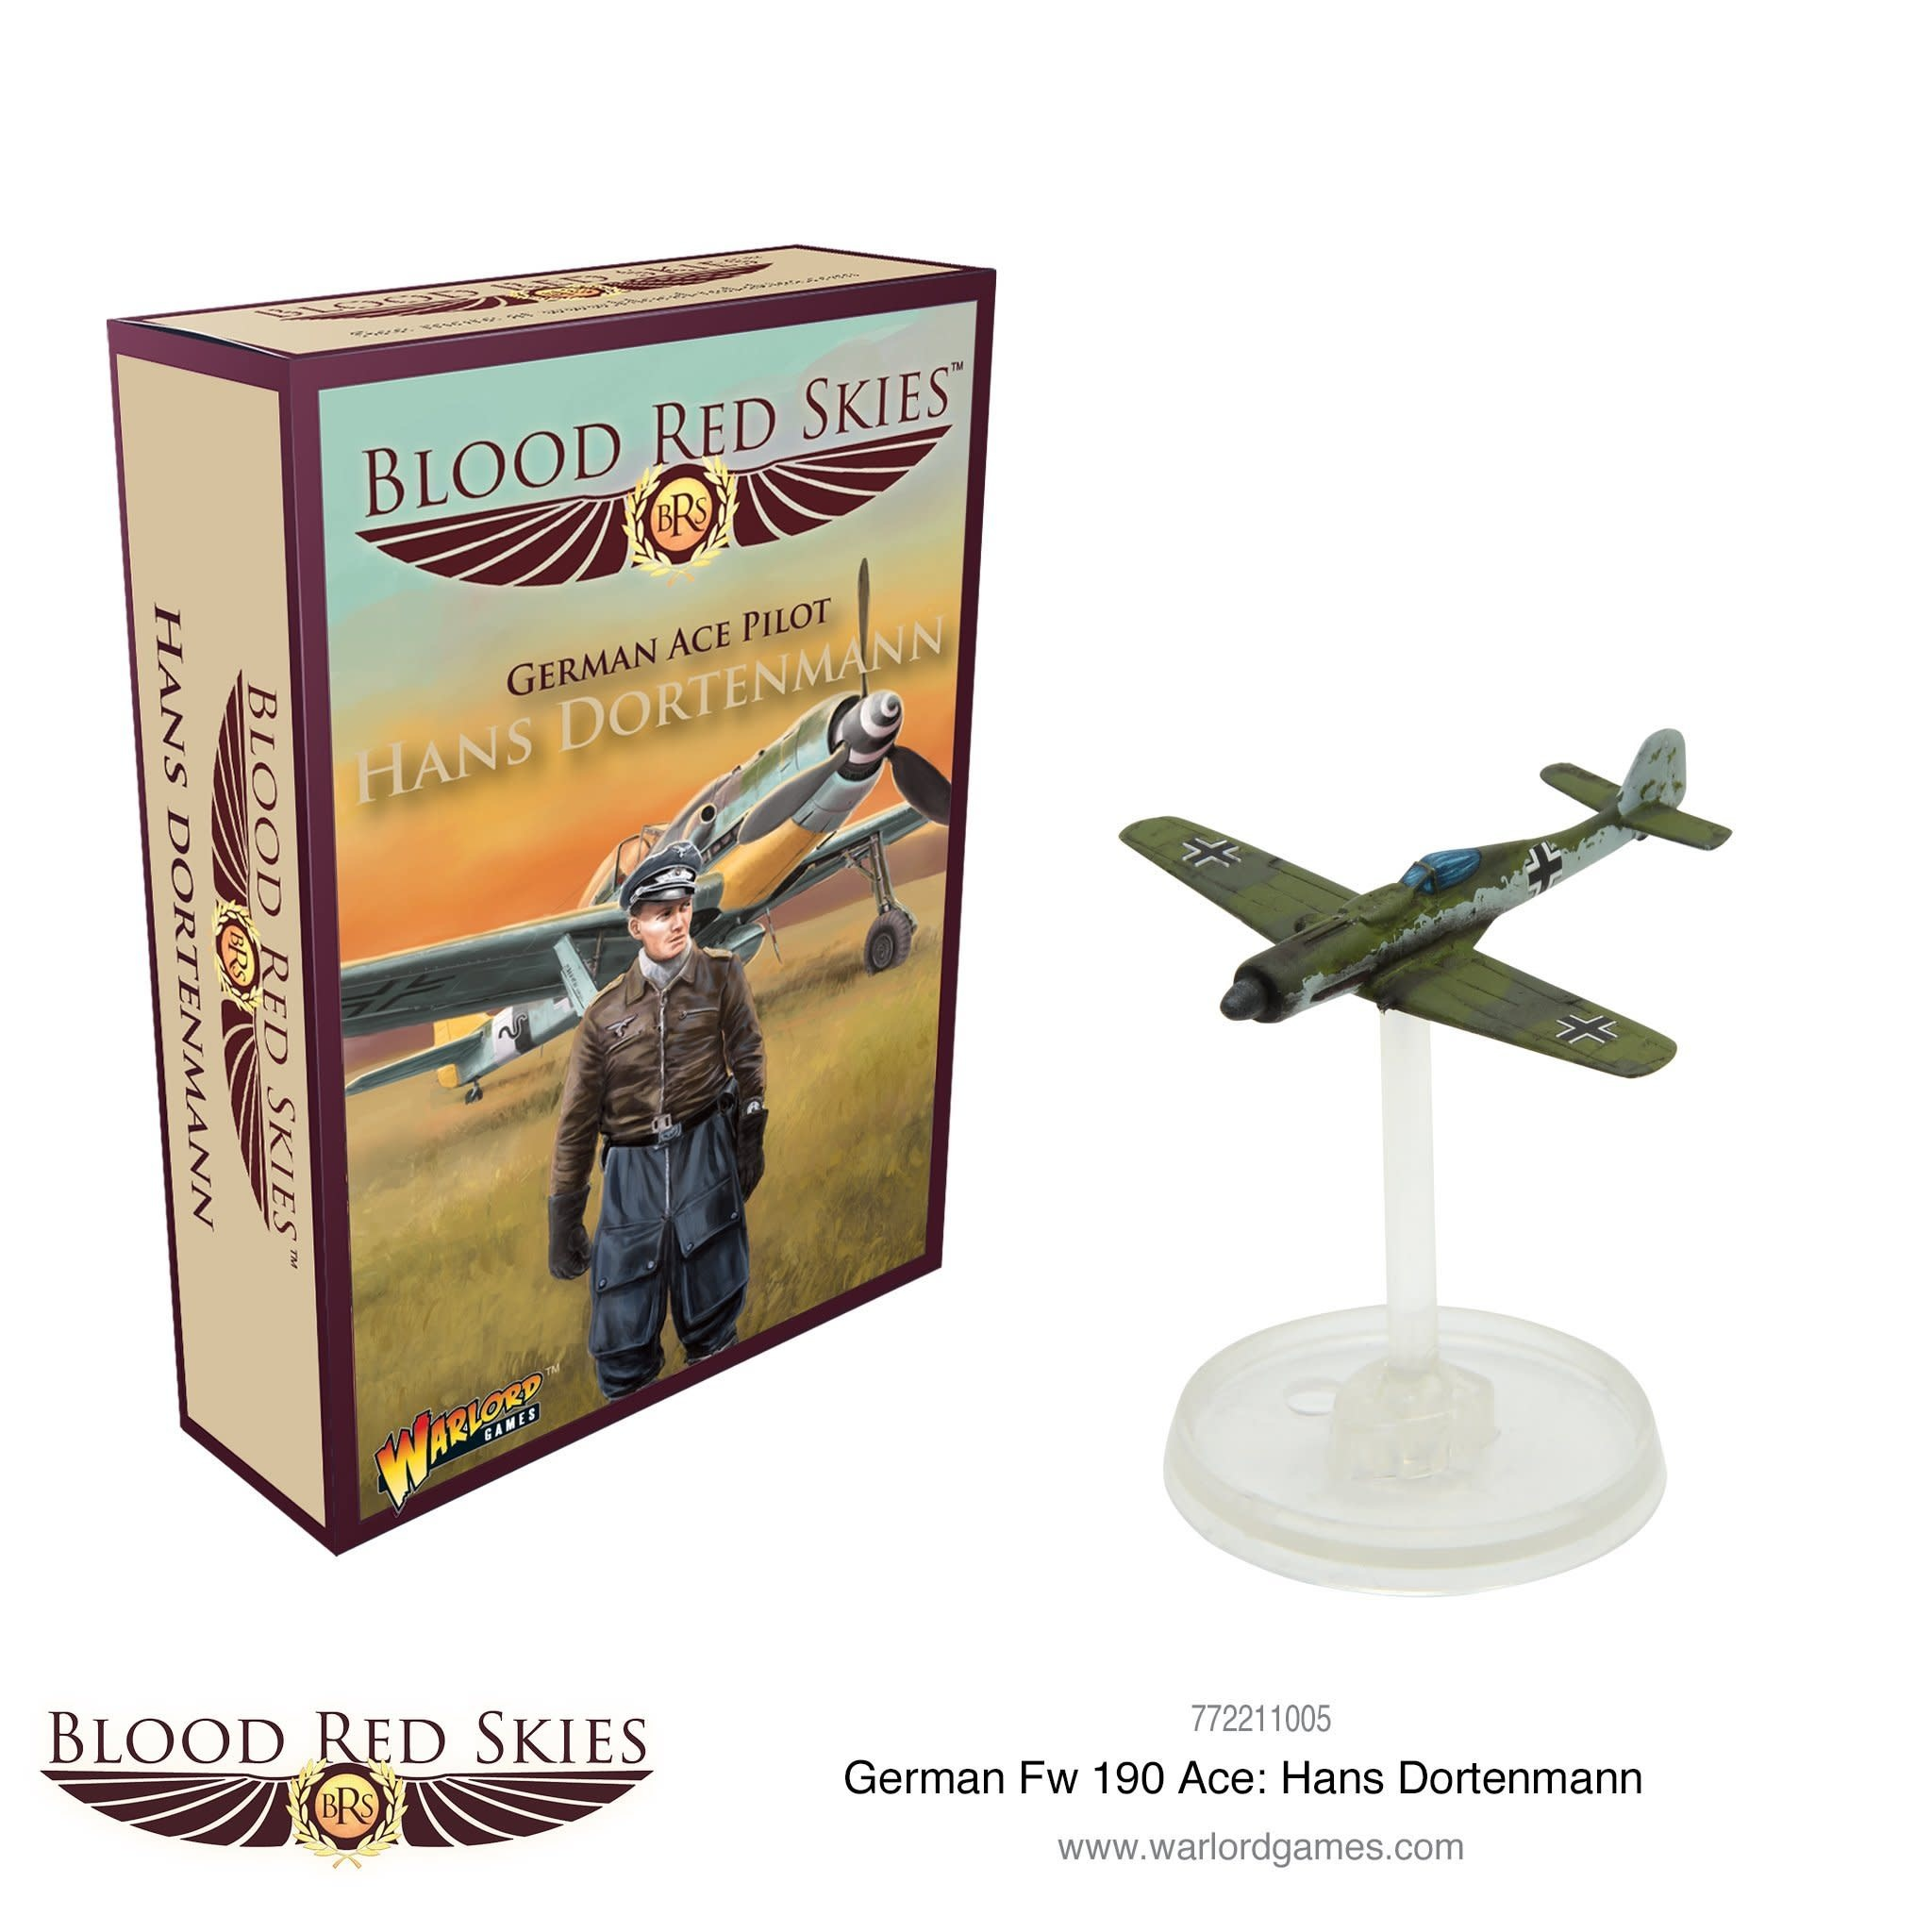 Warlord games Blood Red Skies: German Ace piolt Hans Dortenmann